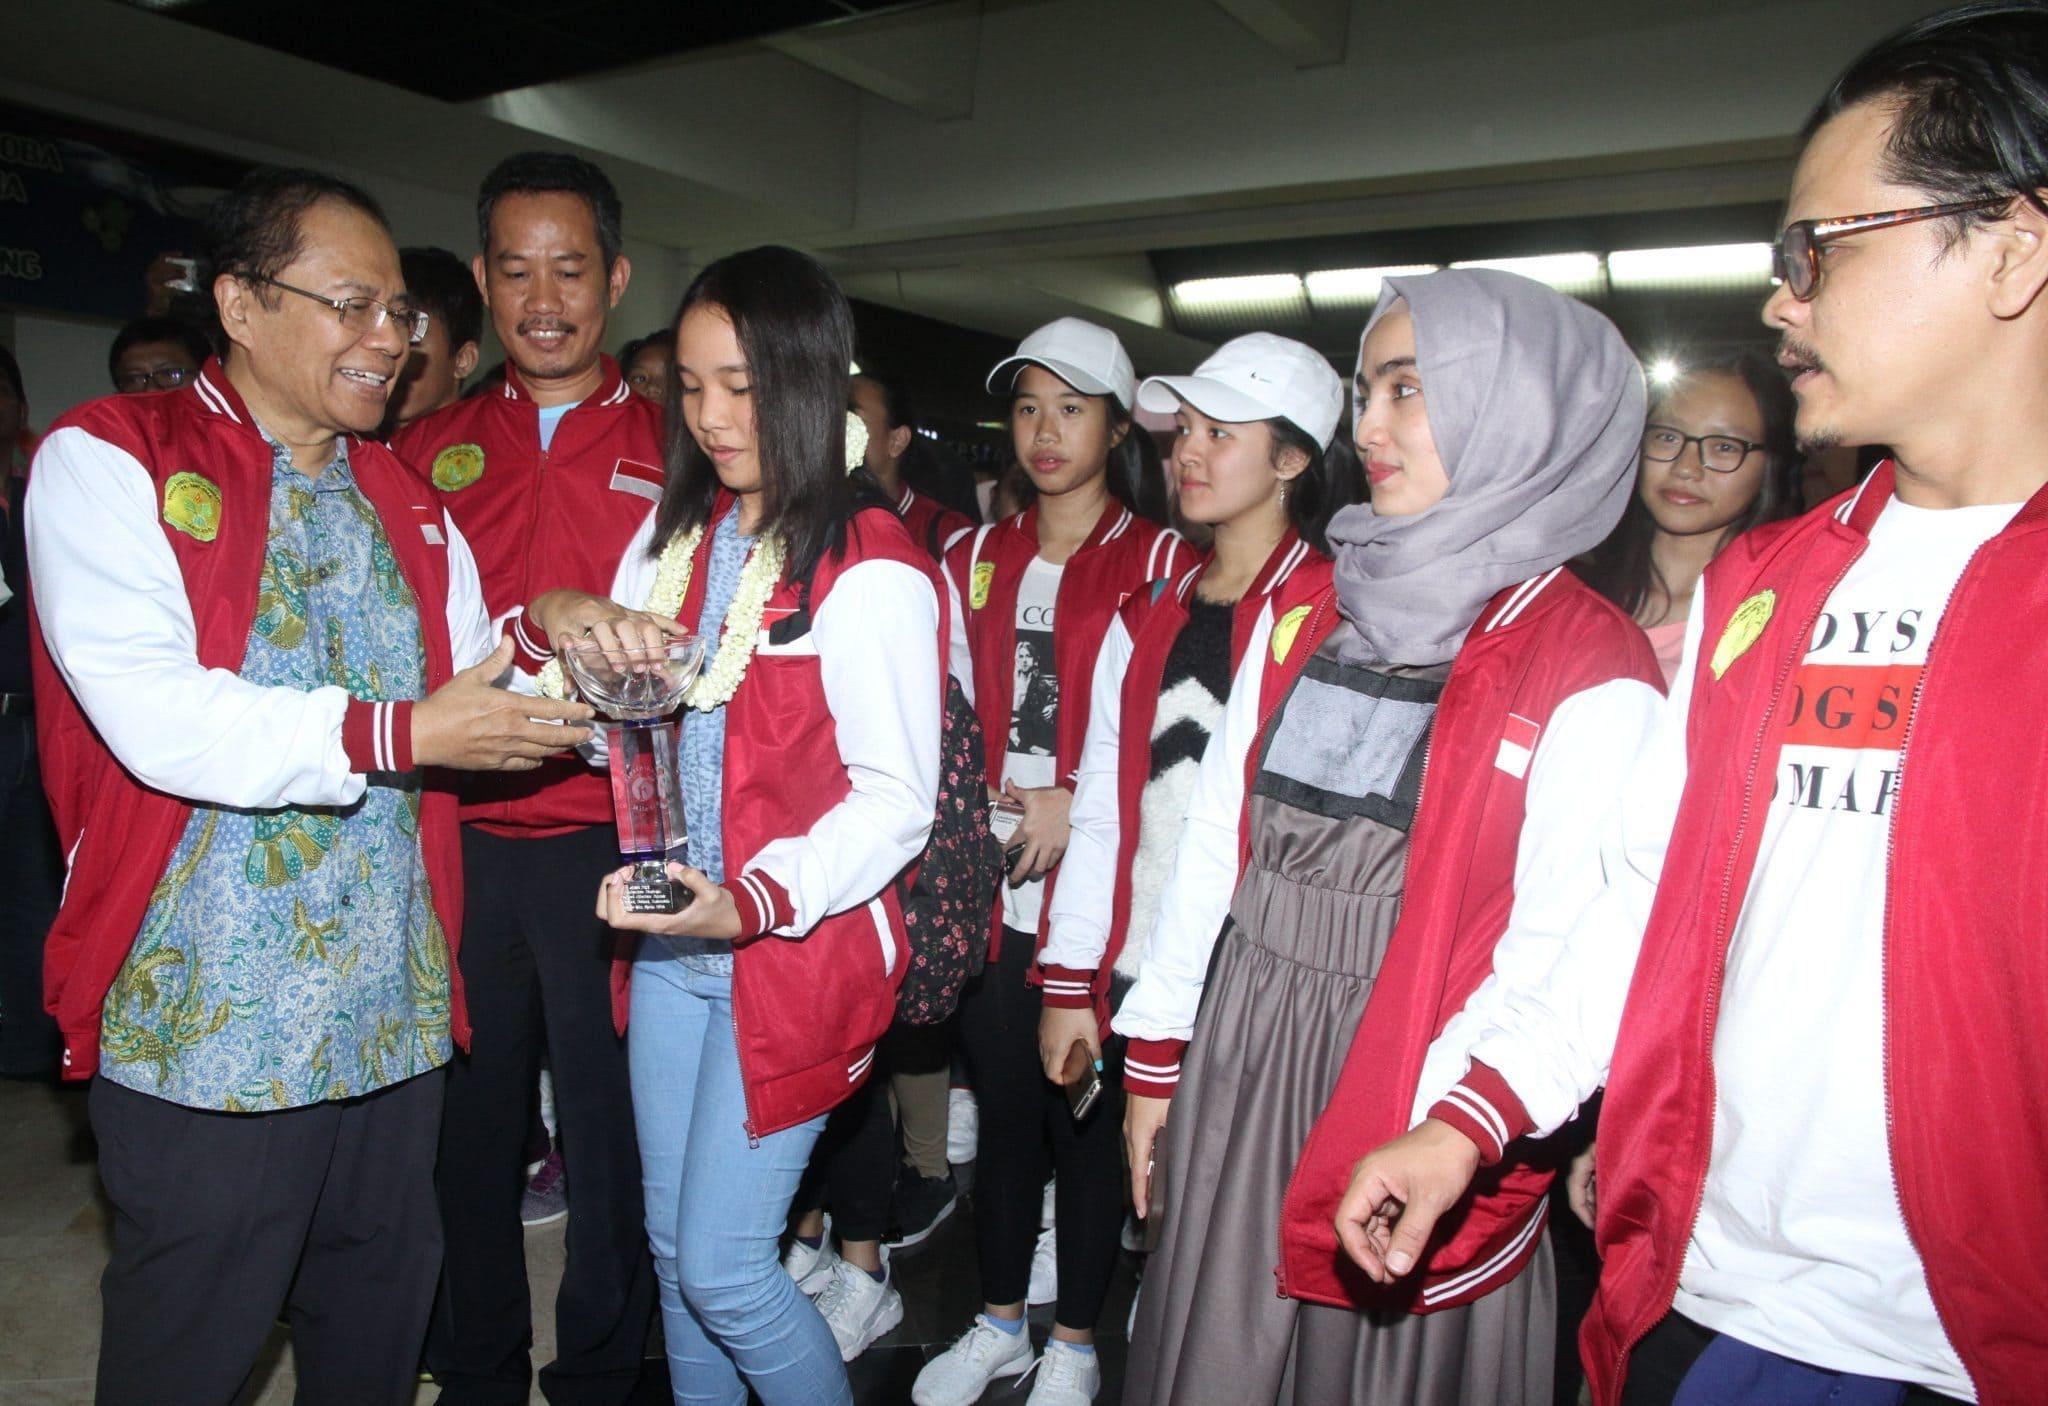 Menko Rizal Ramli Sambut Pemenang Lomba Tari Internasional